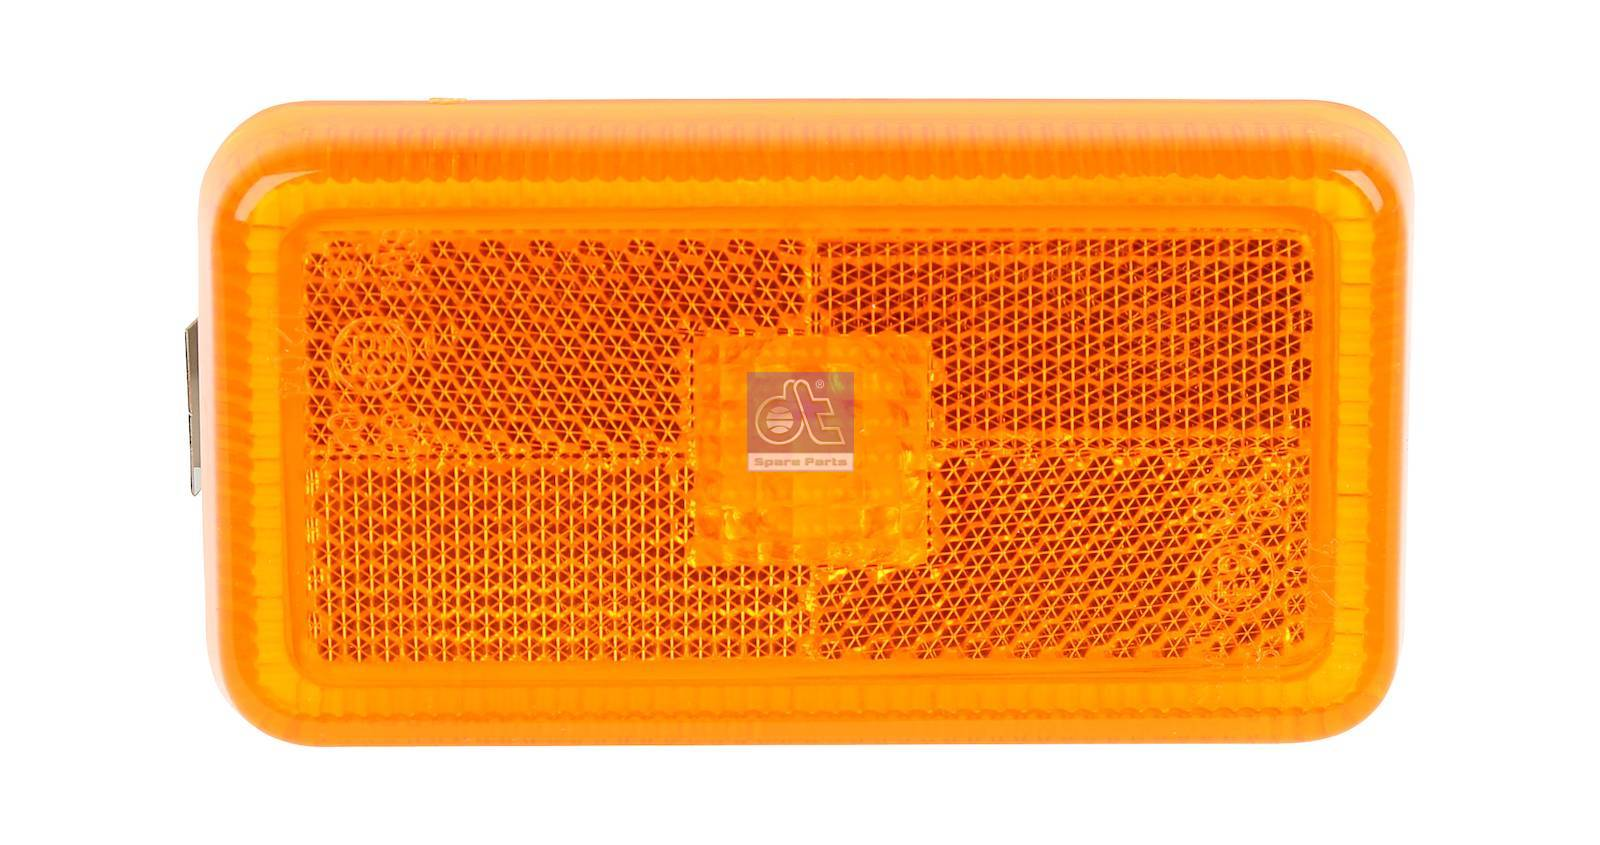 Reflector, orange